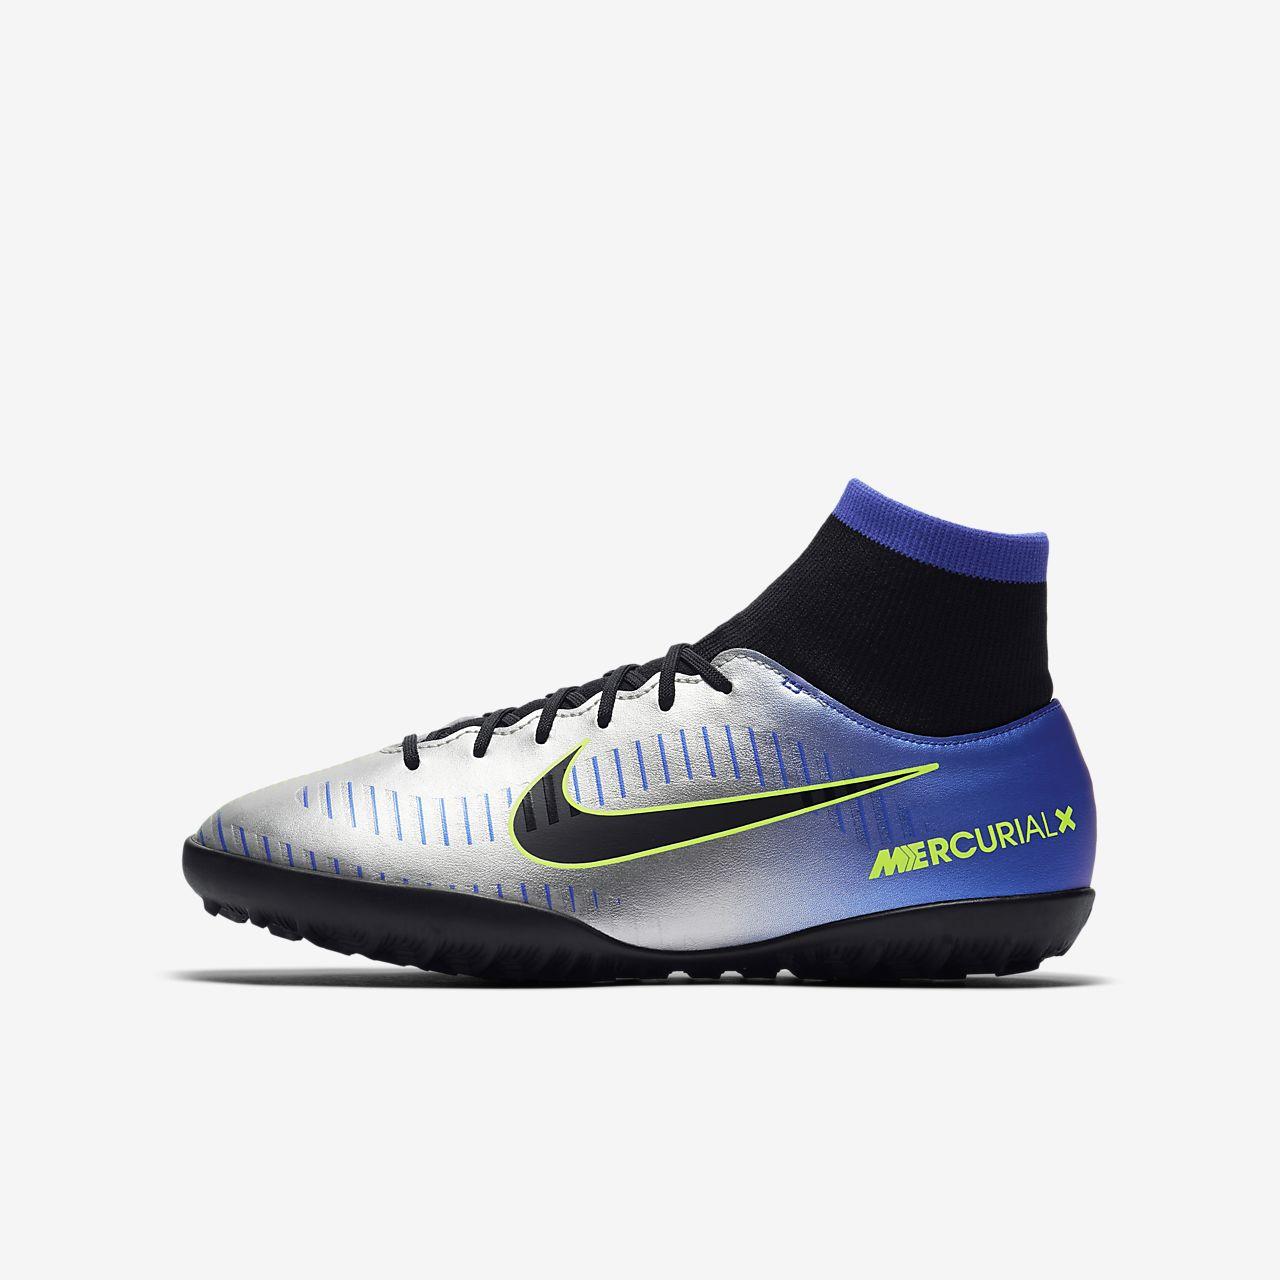 Nike Jr. MercurialX Victory VI Dynamic Fit Neymar TF (921492-407) Girls Football Boots Black/Blue